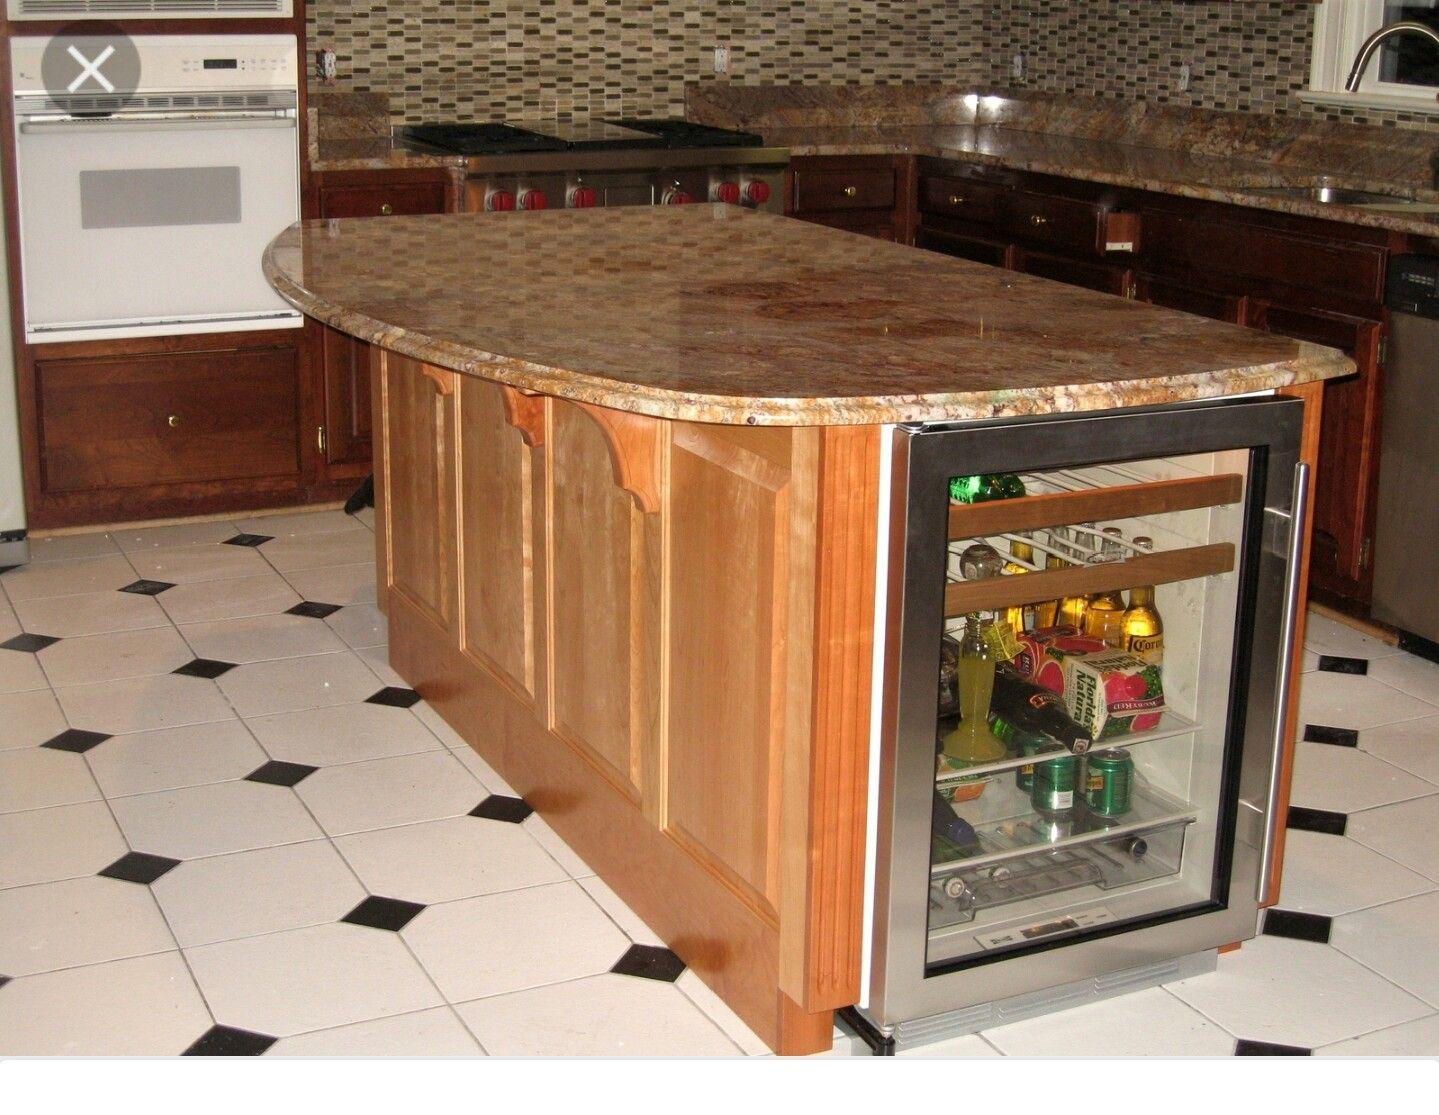 Kitchen island, island counter. I would like storage rather than beverage refrigerator